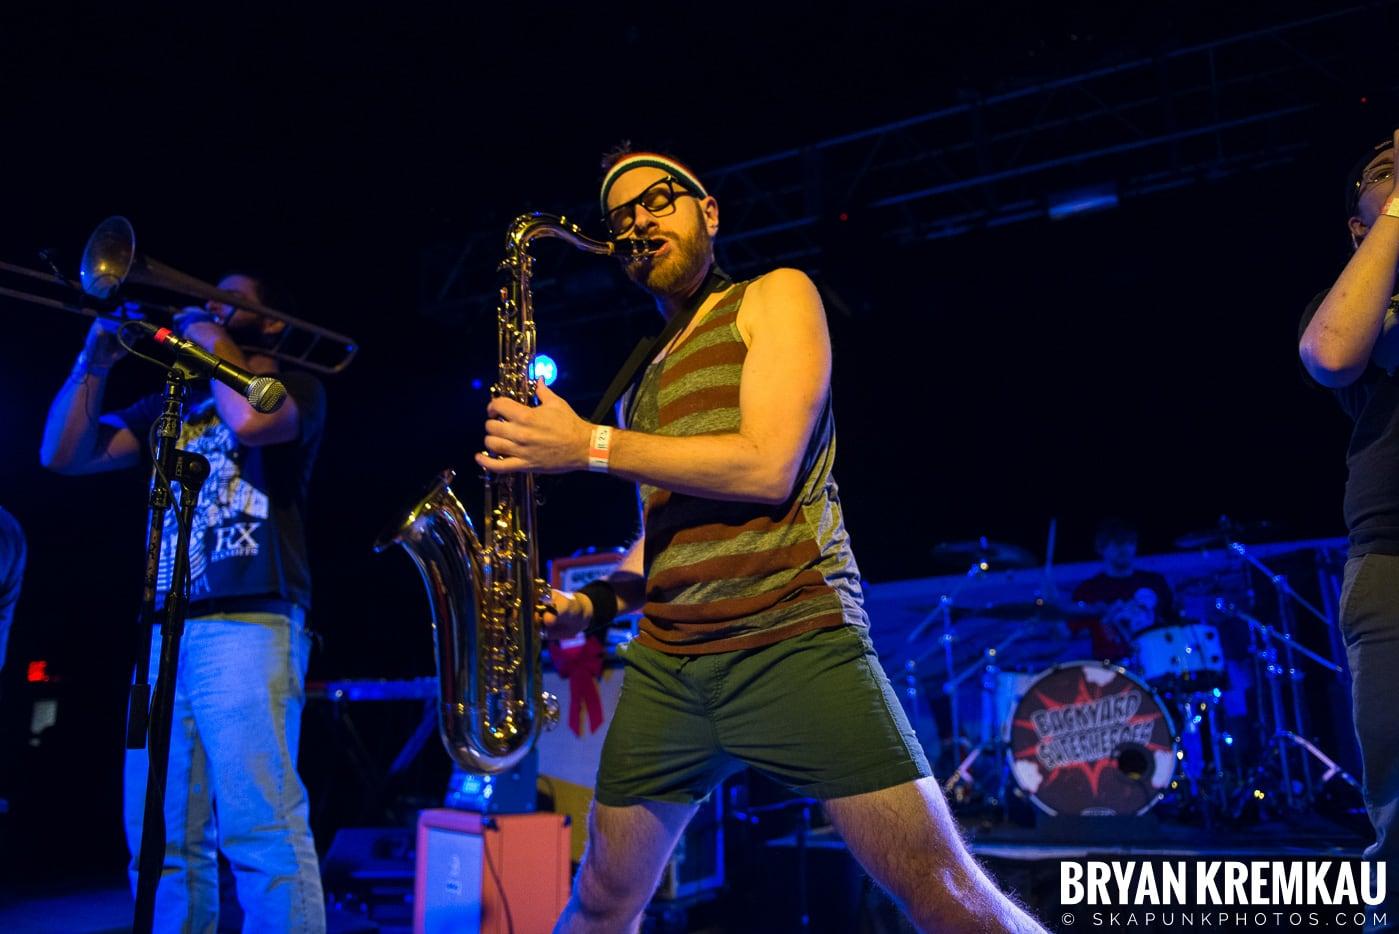 Backyard Superheroes @ Starland Ballroom, Sayreville, NJ - 11.23.18 (37)